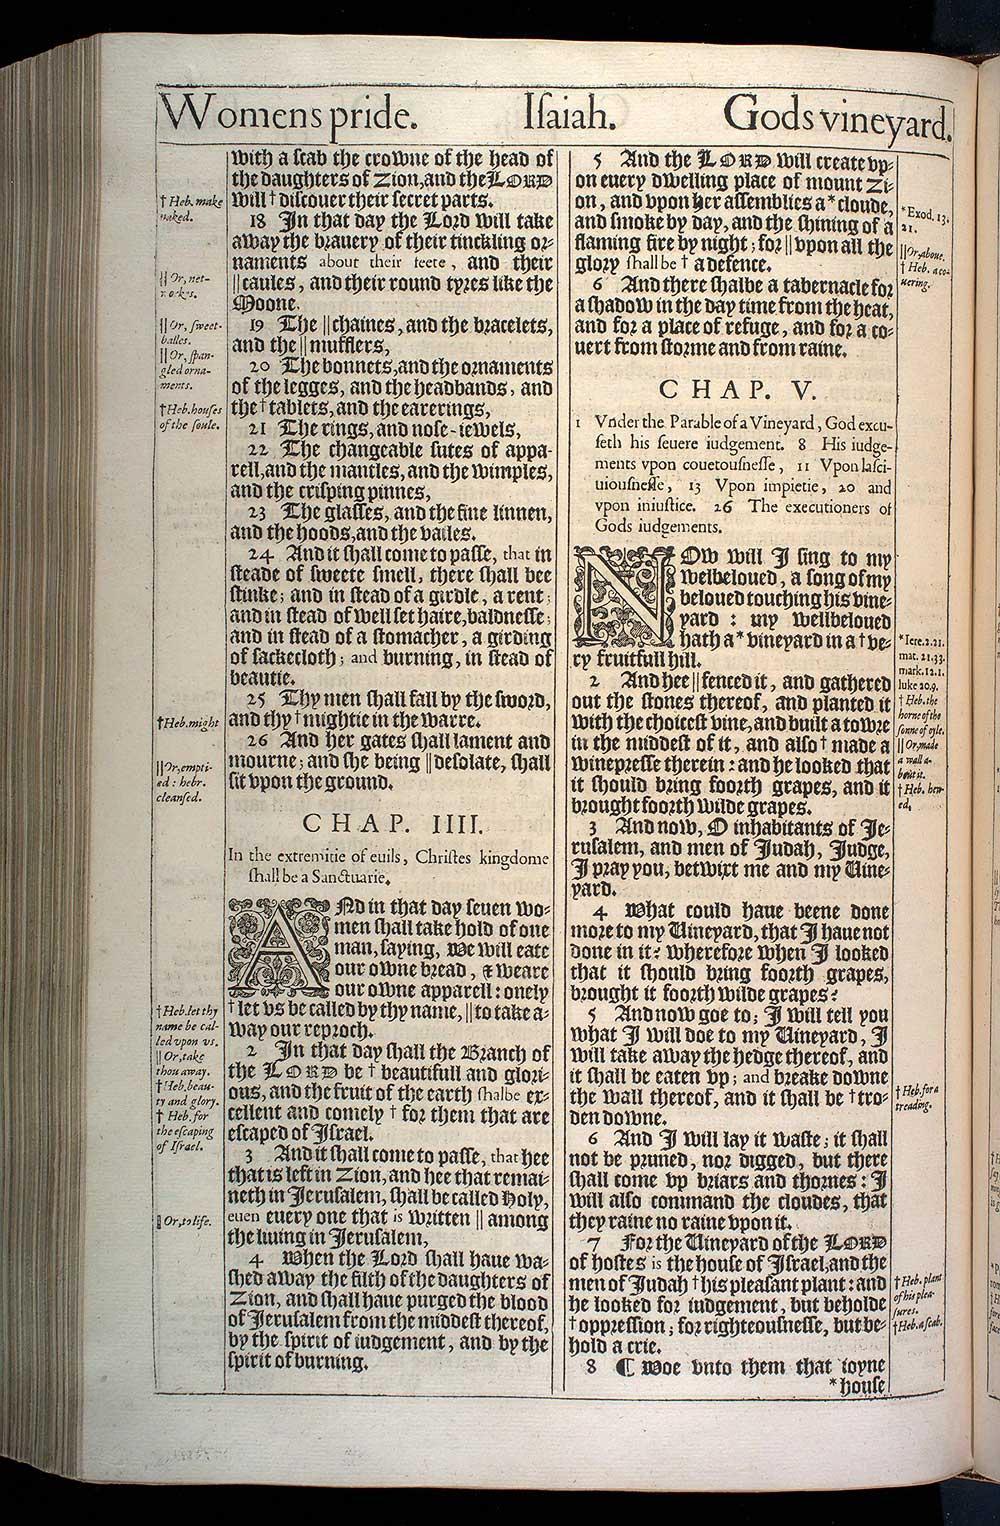 Isaiah Chapter 5 Original 1611 Bible Scan